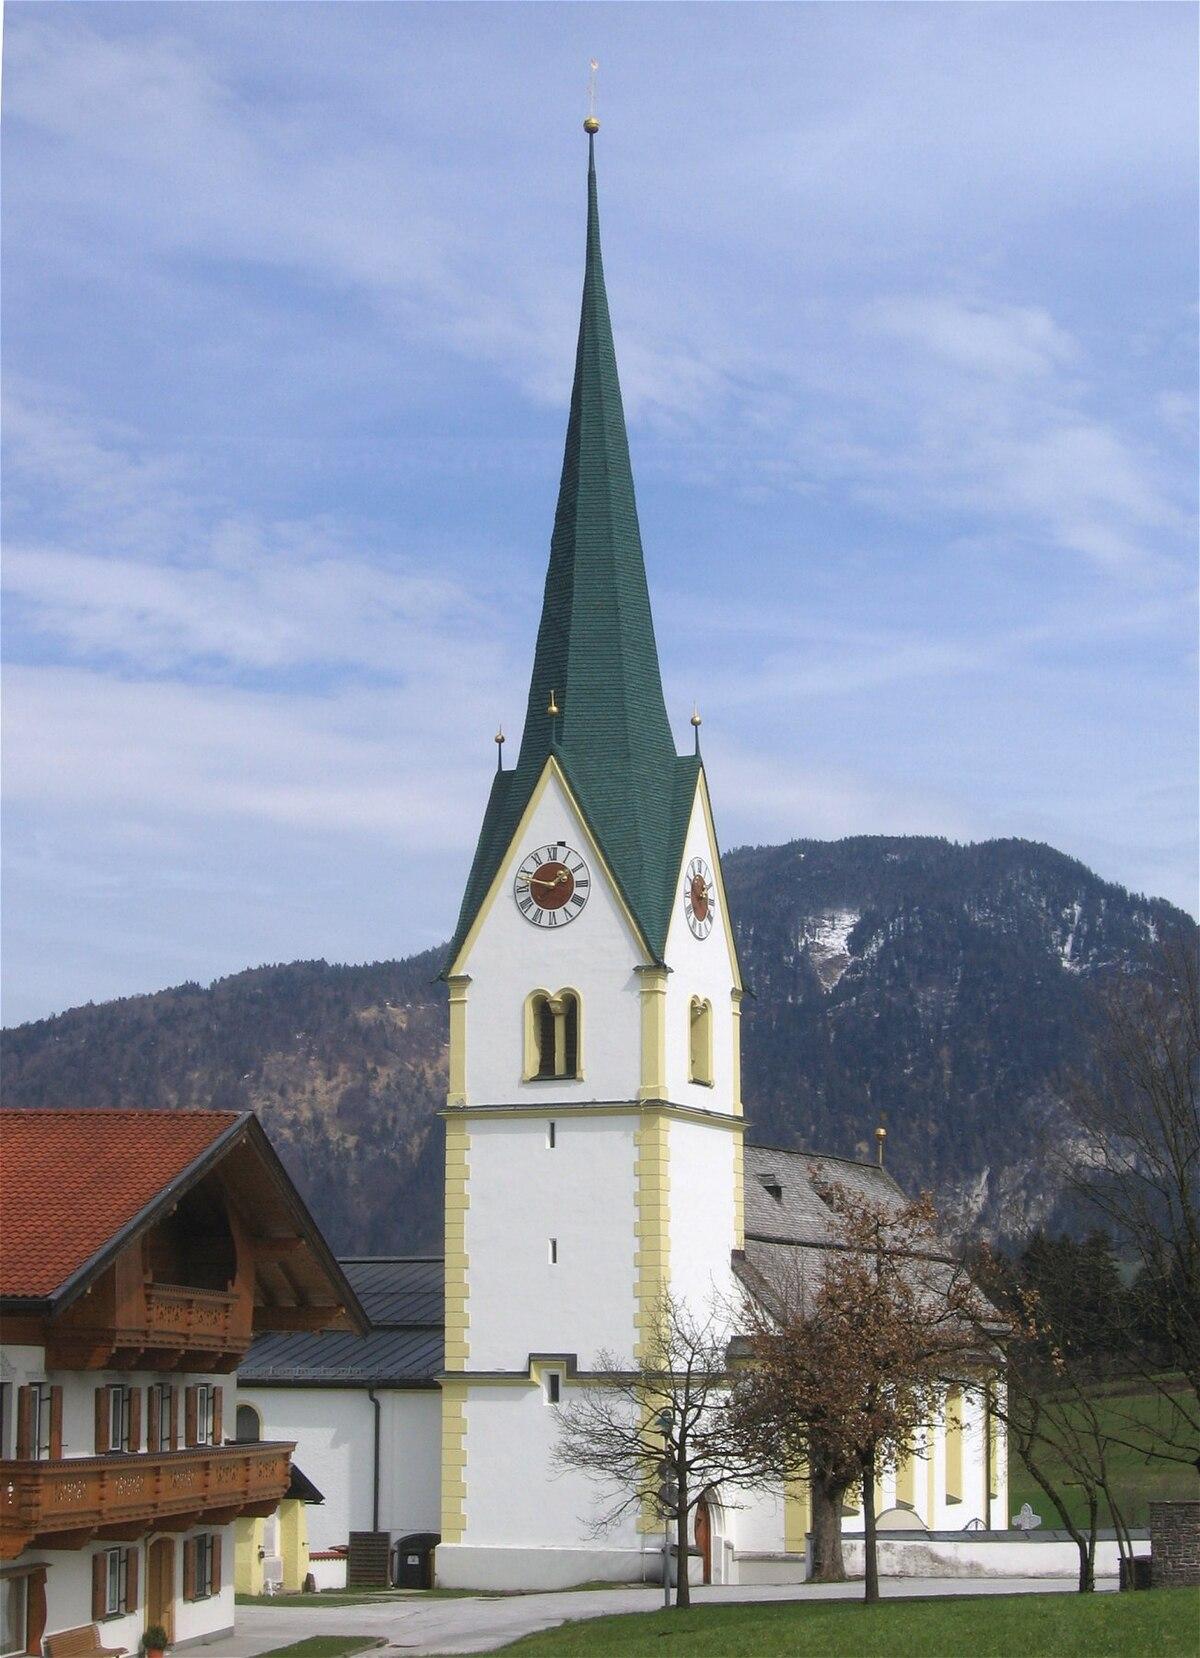 Accommodation Schwoich - Bergfex